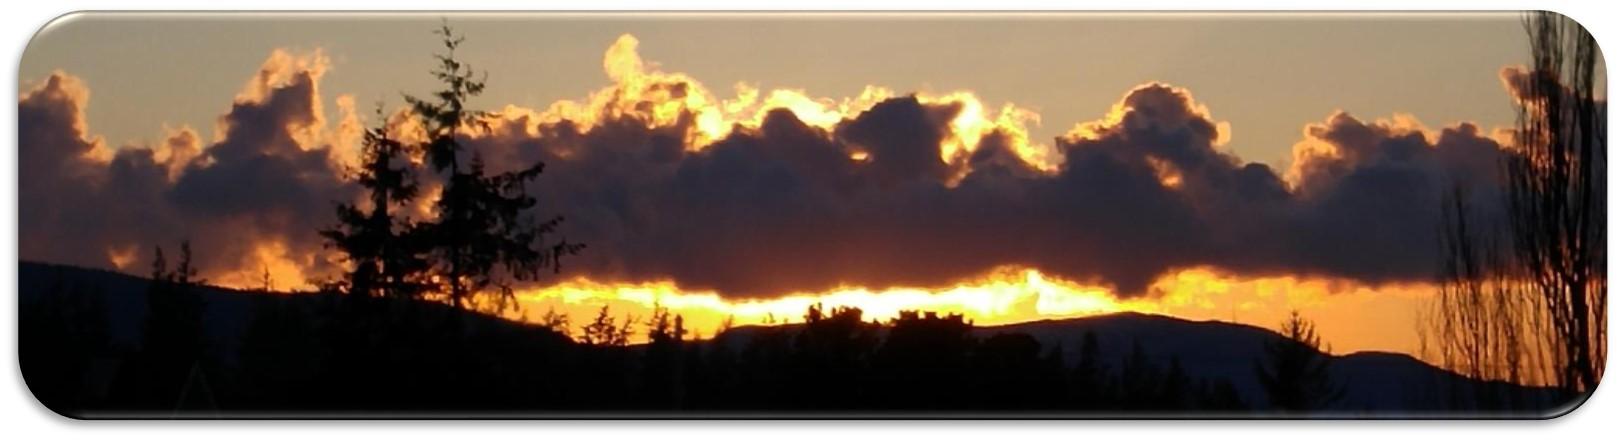 RestoreProcess_sunset6.jpg